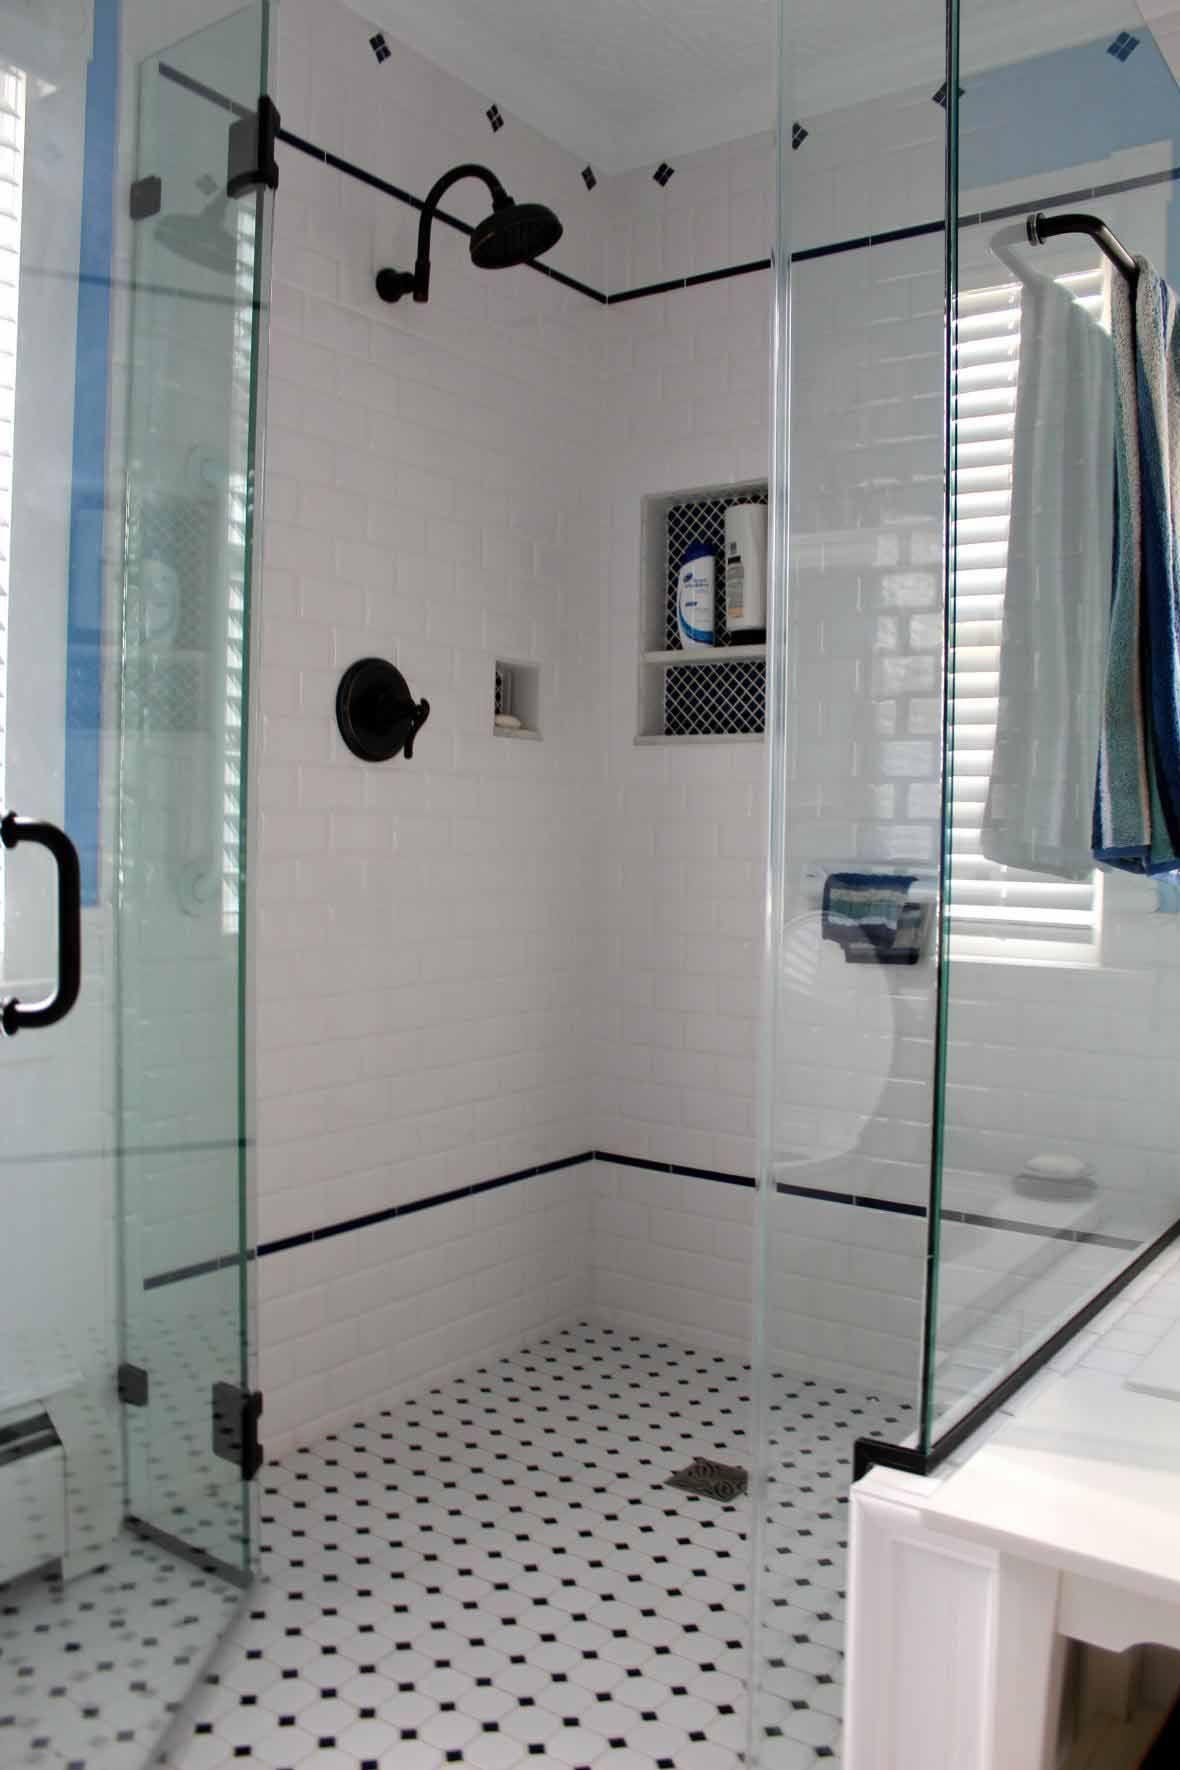 Minimalist Interior Bathroom Design With Foxy Vintage